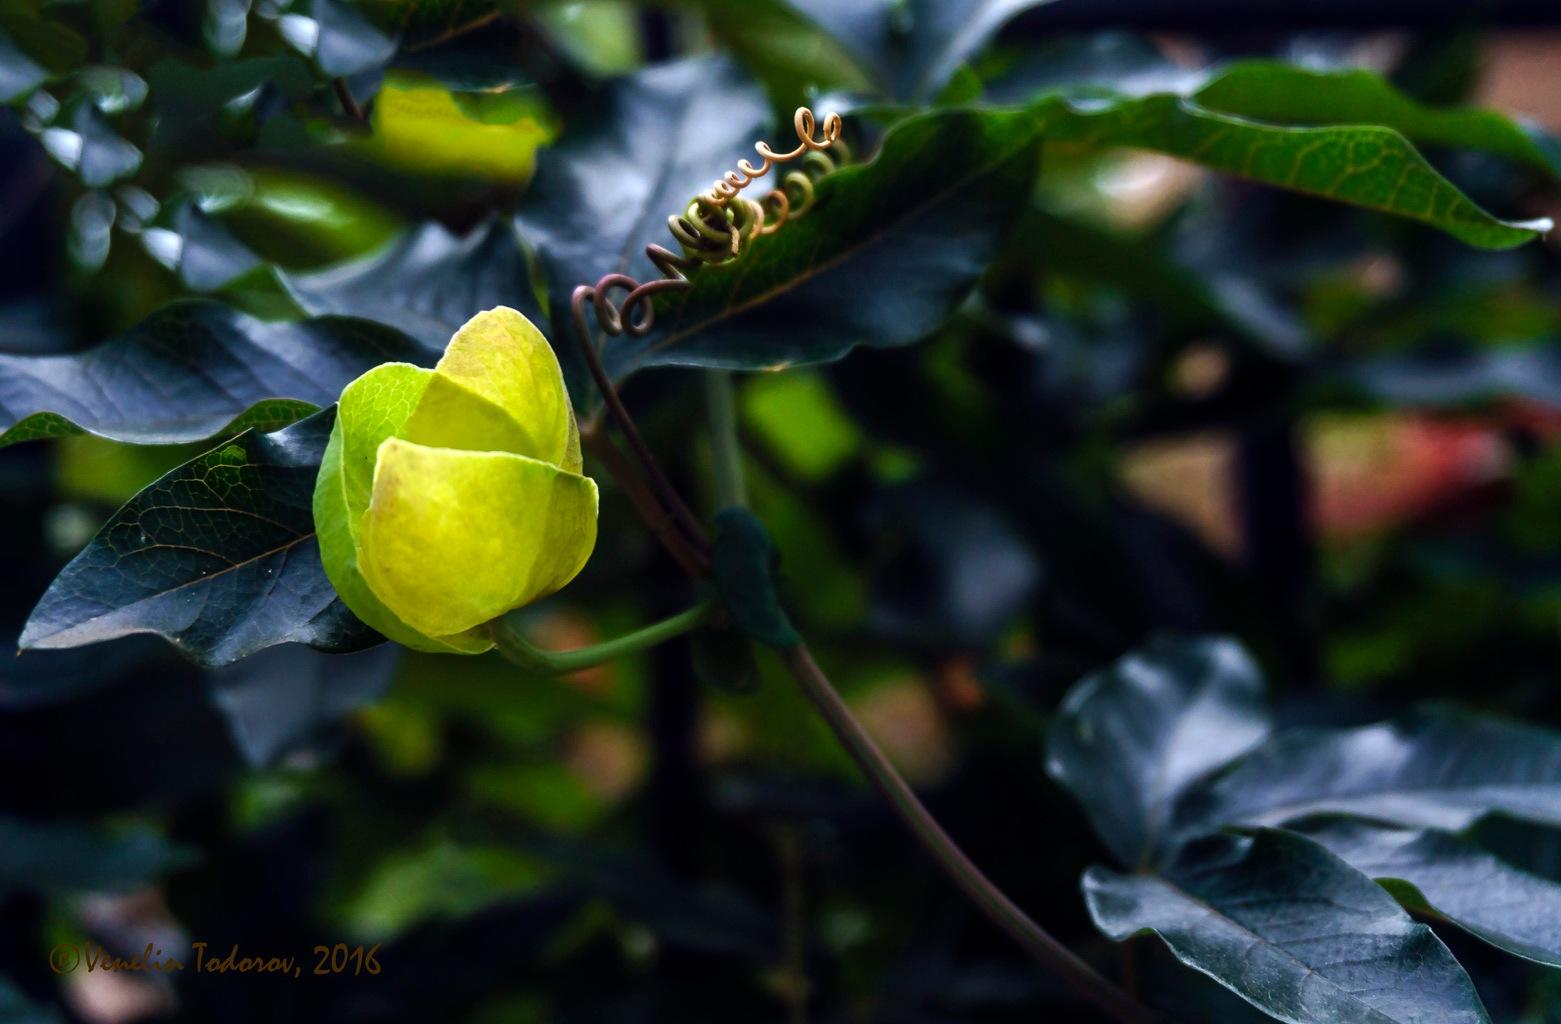 Beauty of flower_2 by Venelin Todorov